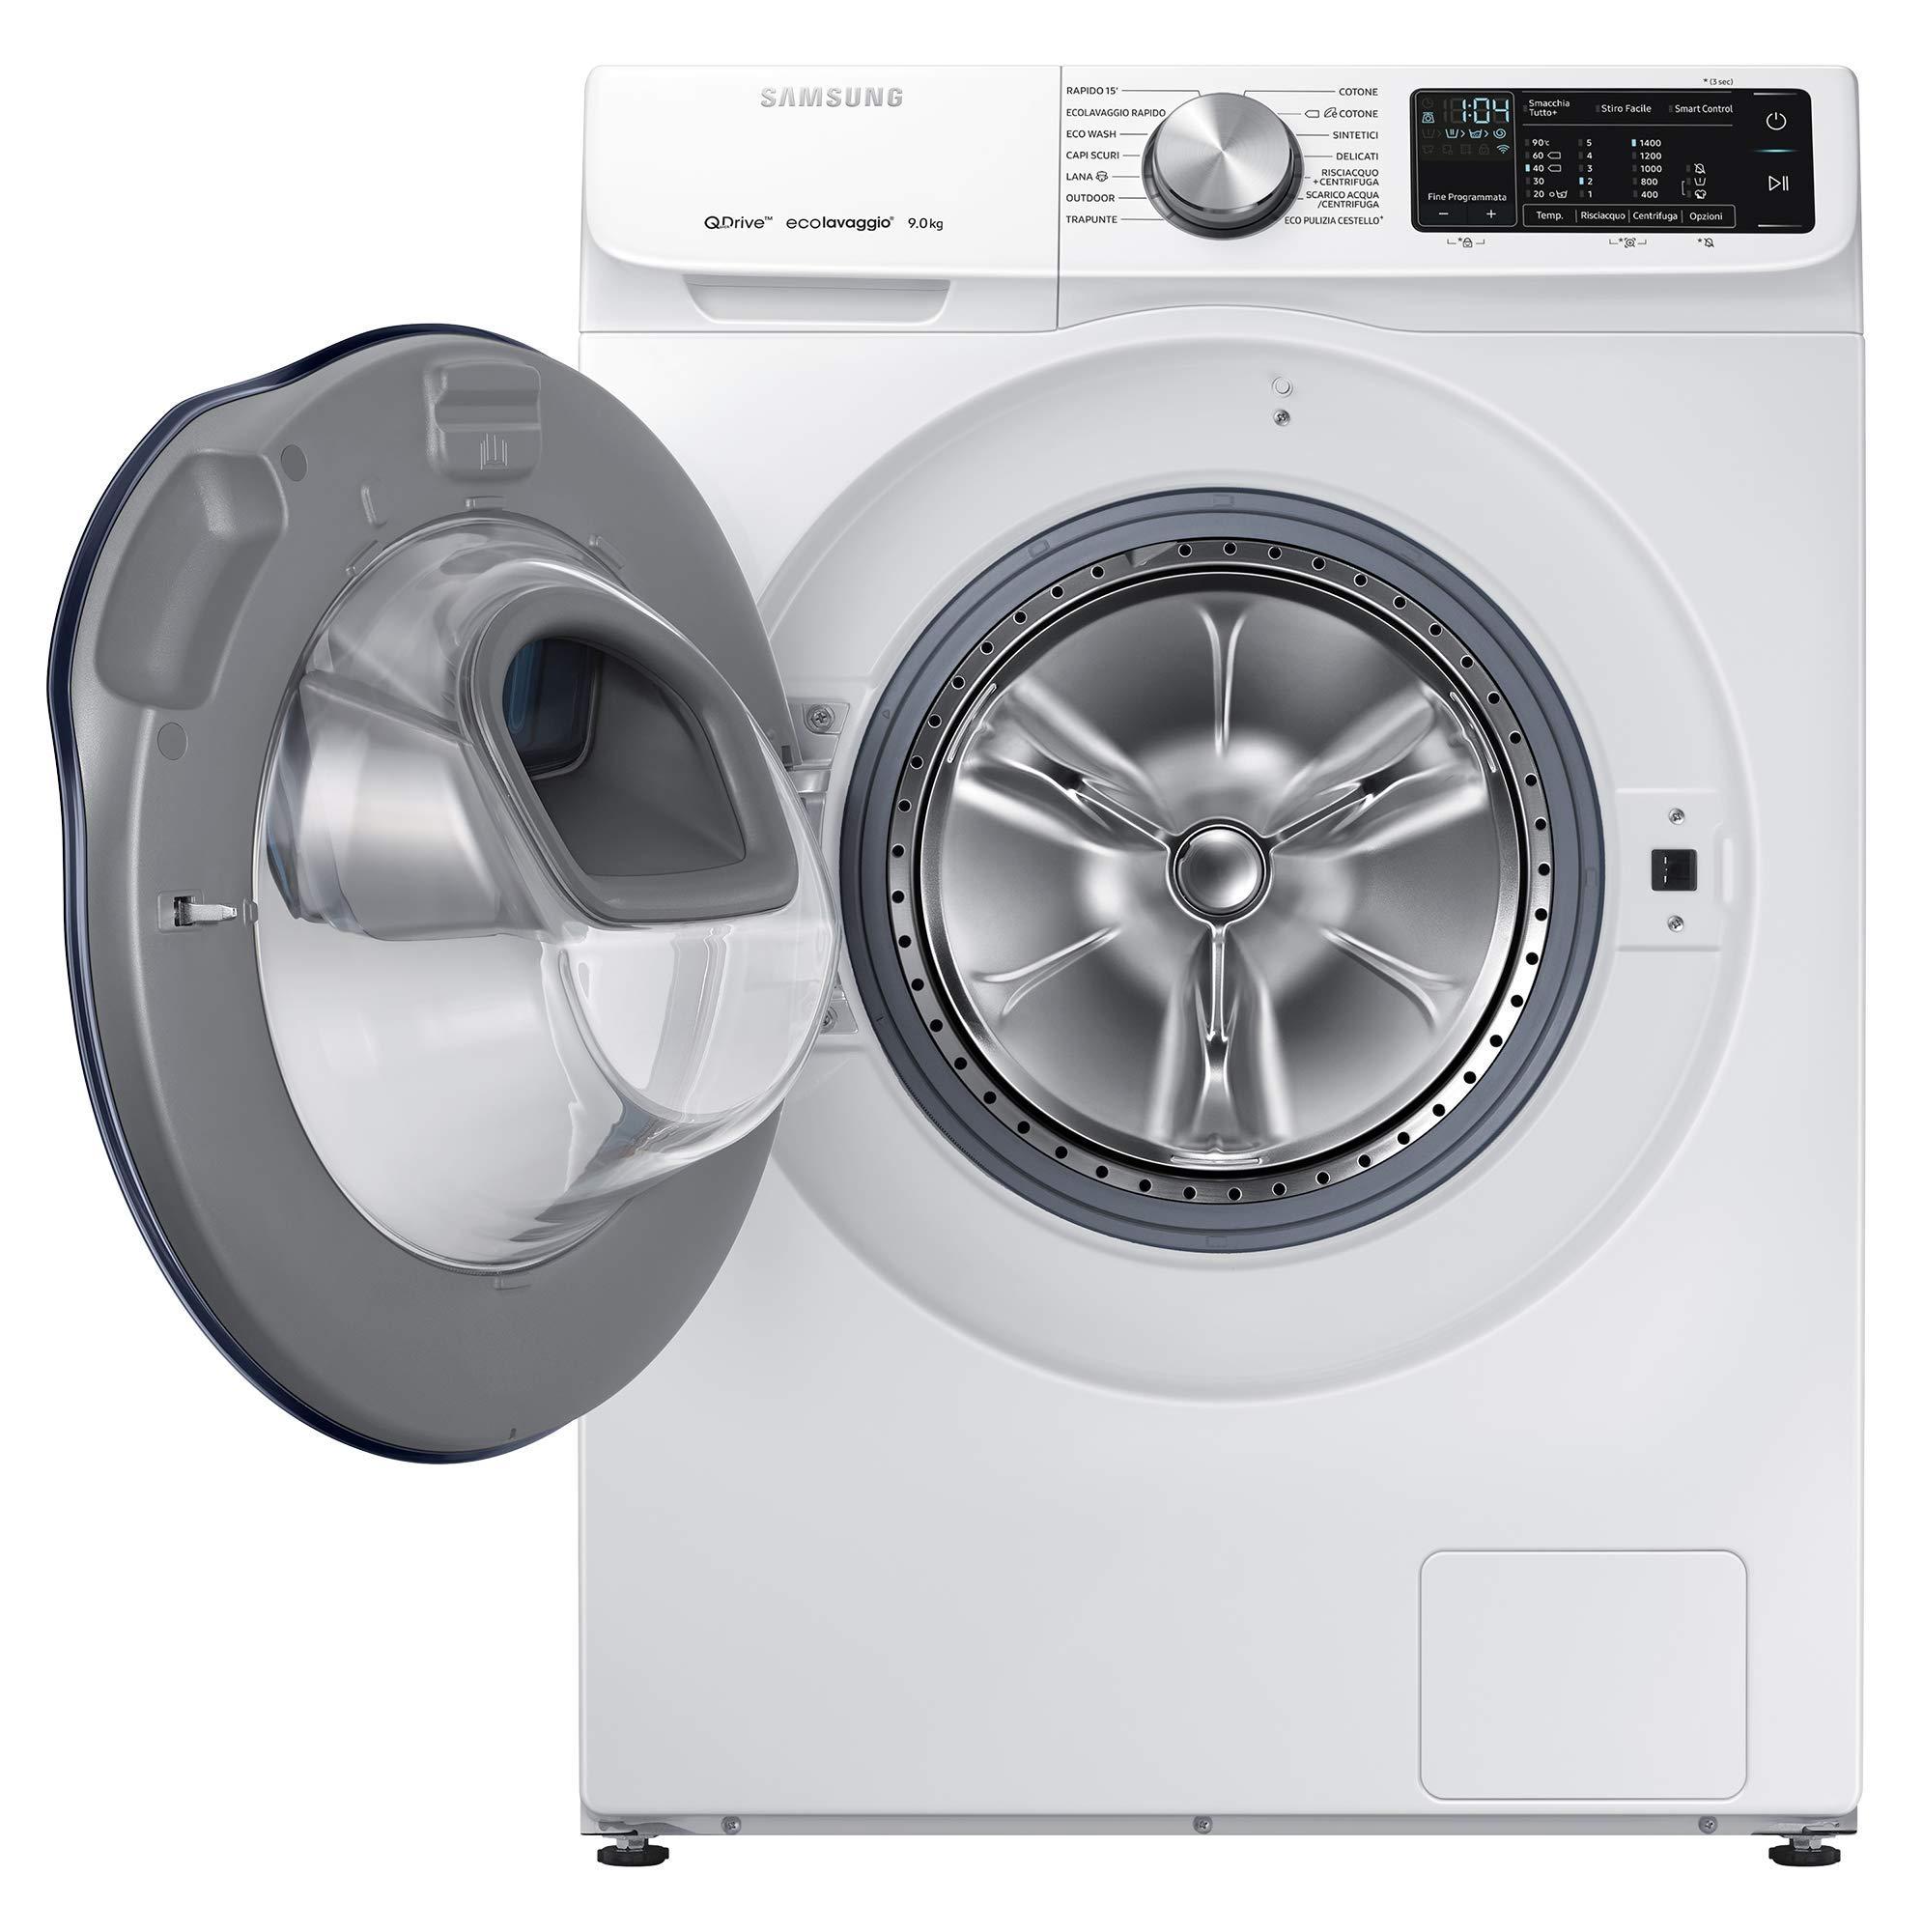 Samsung-ww90-m642opw-autonome-Belastung-Bevor-9-kg-1400trmin-A-40-schwarz-wei-Waschmaschine–Waschmaschinen-autonome-bevor-Belastung-schwarz-wei-drehbar-Oberflche-links-LED